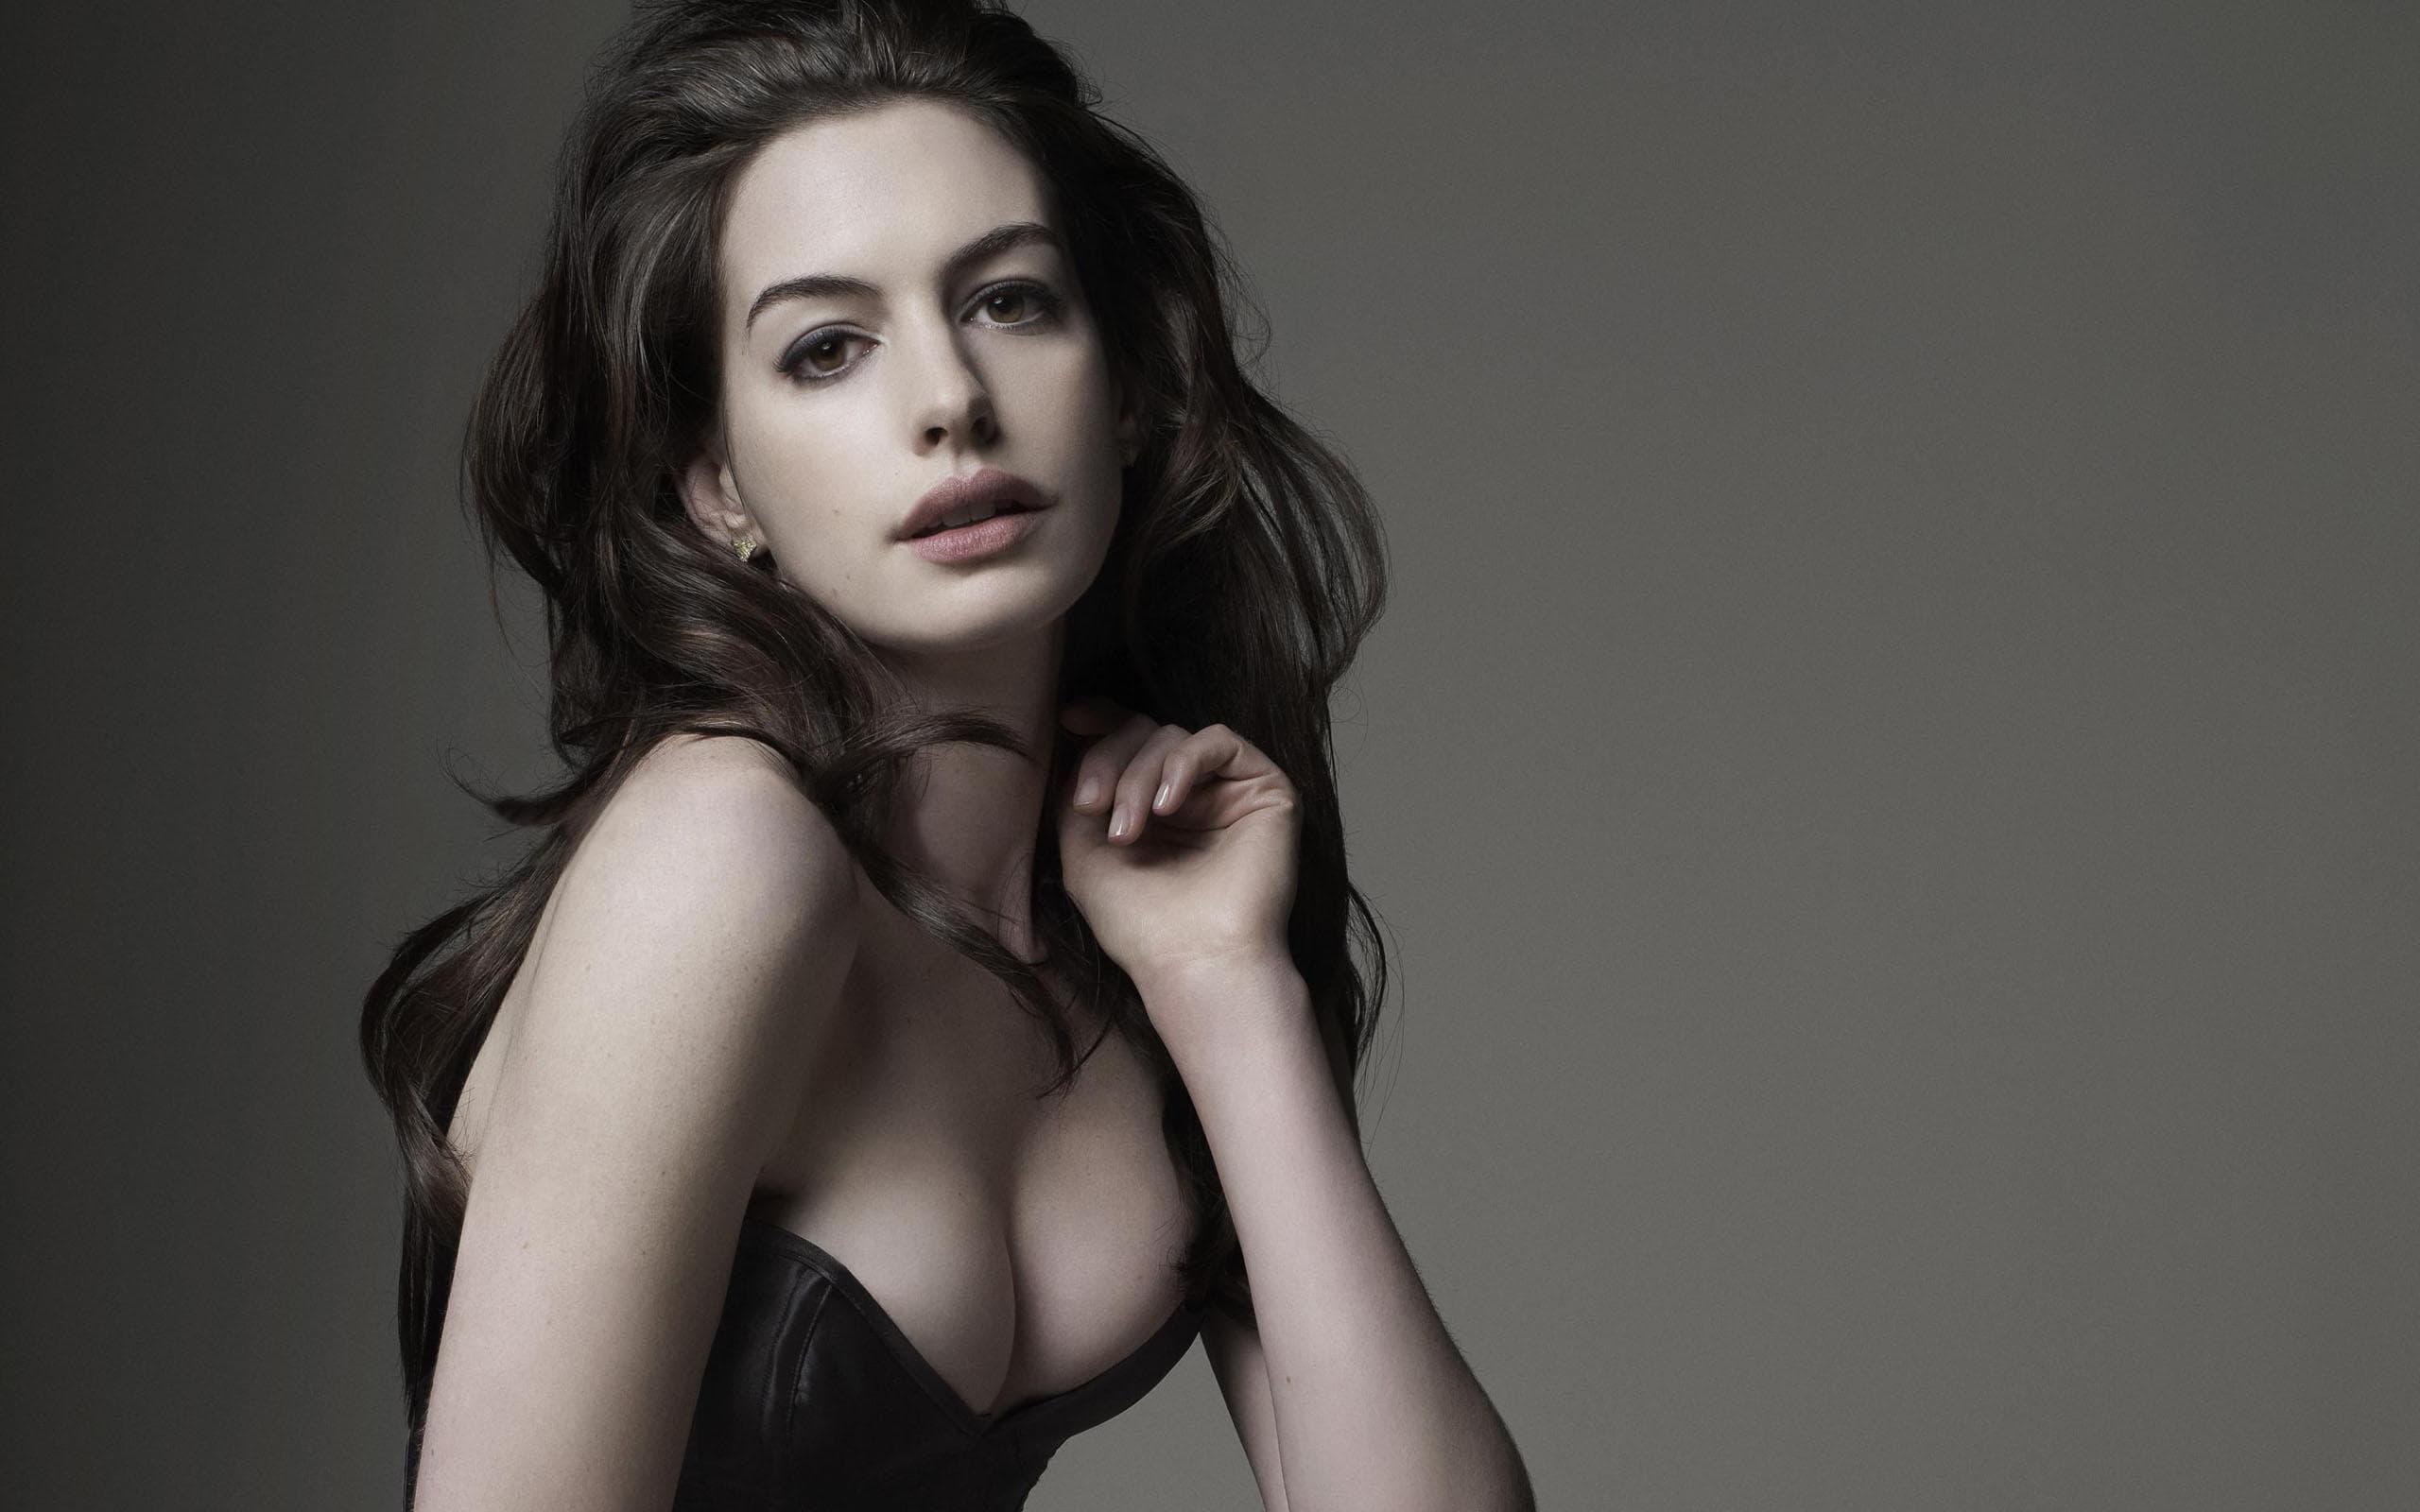 Anne Hathaway Hd Wallpapers 7wallpapersnet